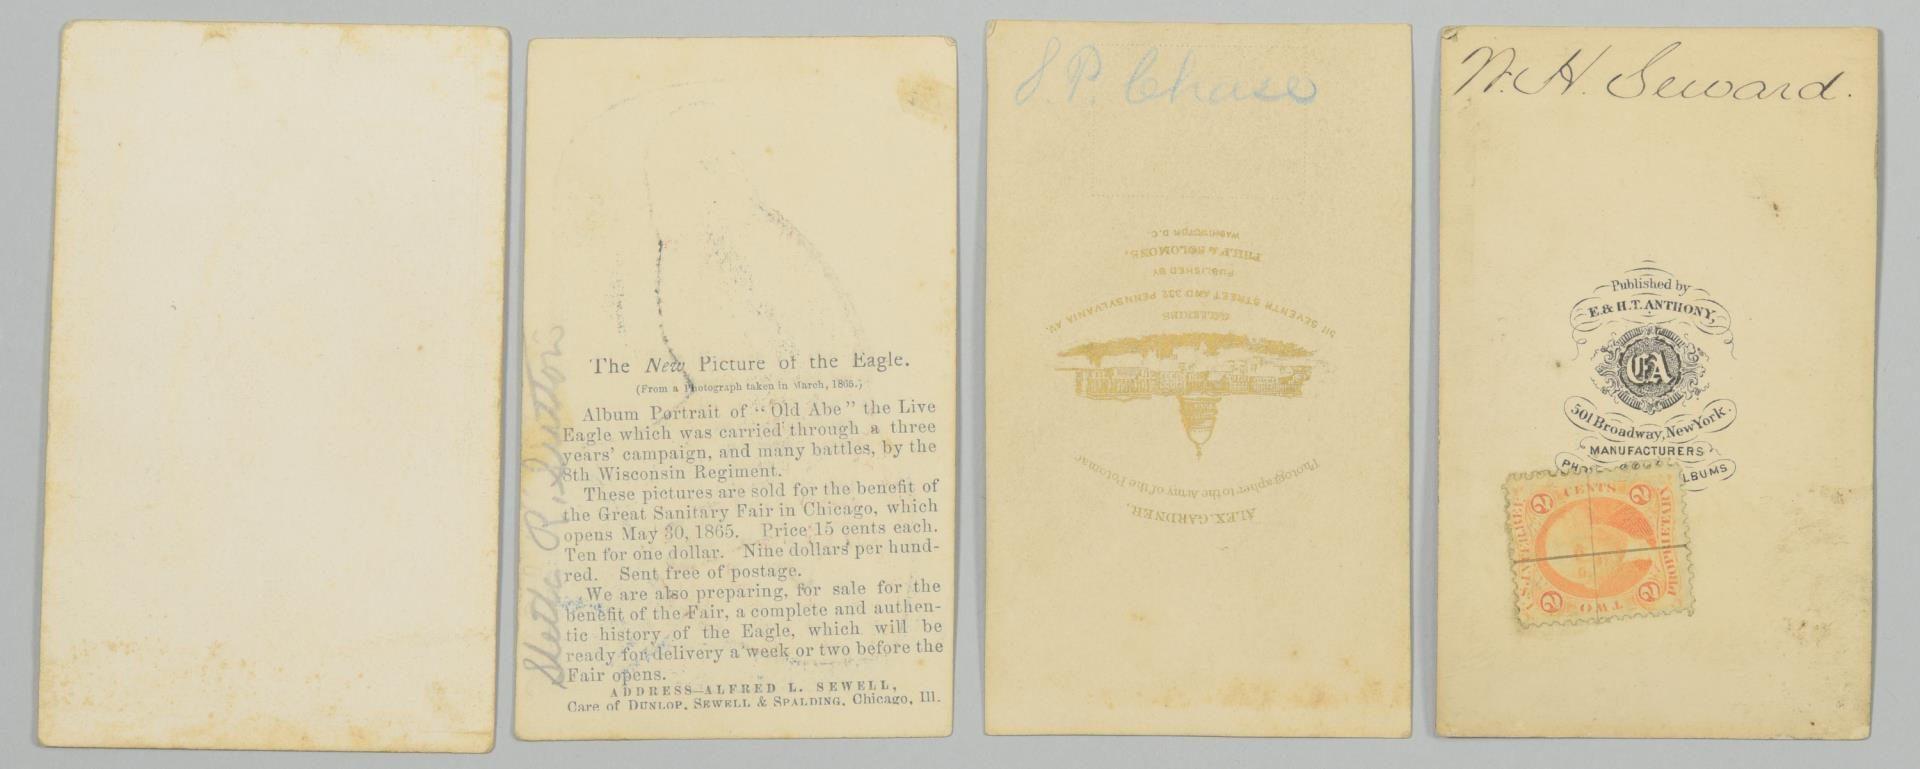 Lot 228: Group of 8 Civil War & TN CDV Cards